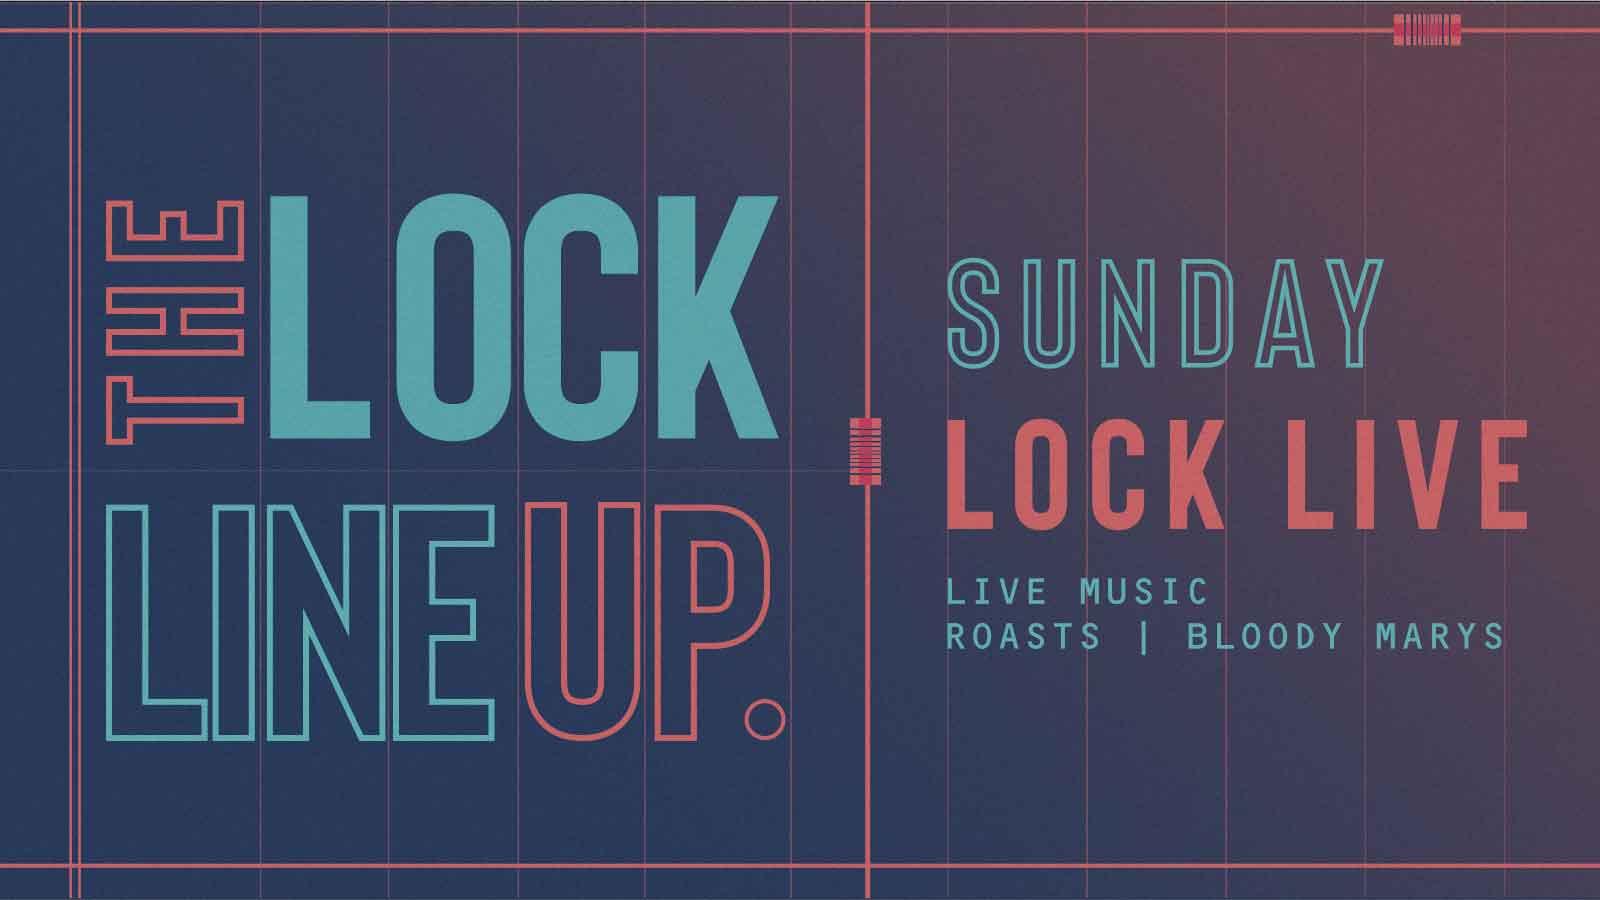 Lock Live – Every Sunday